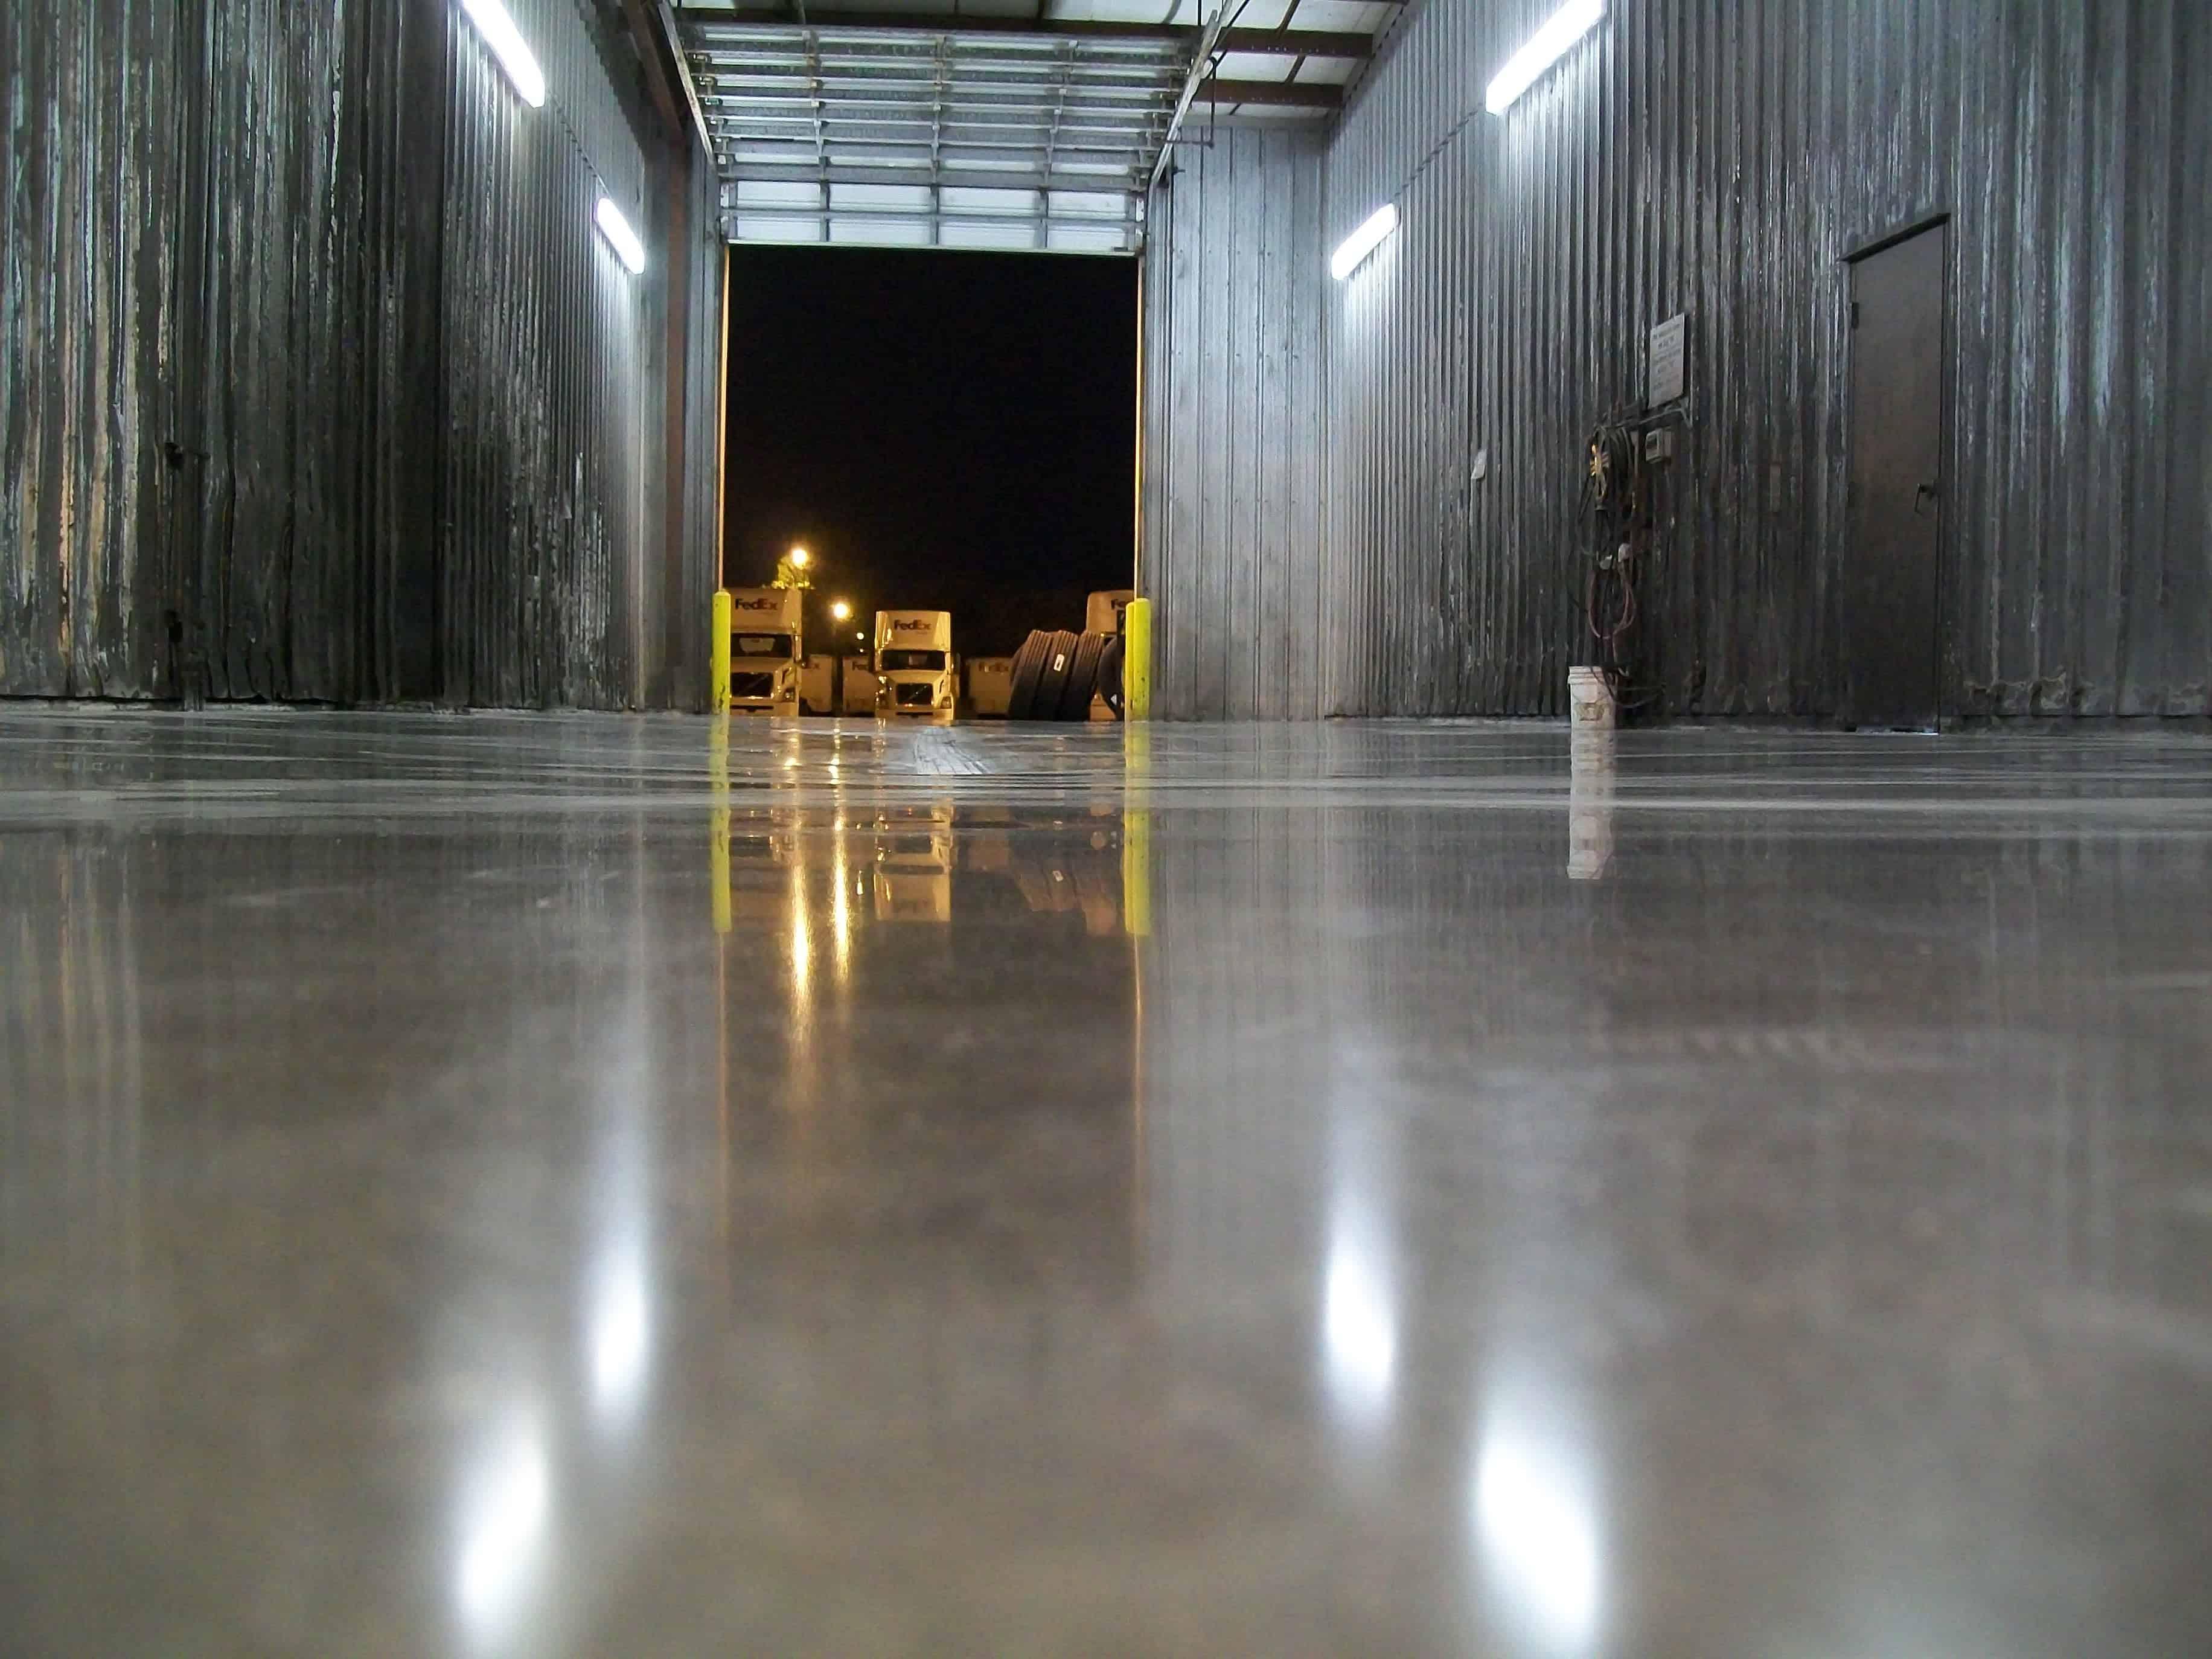 beton parlatma